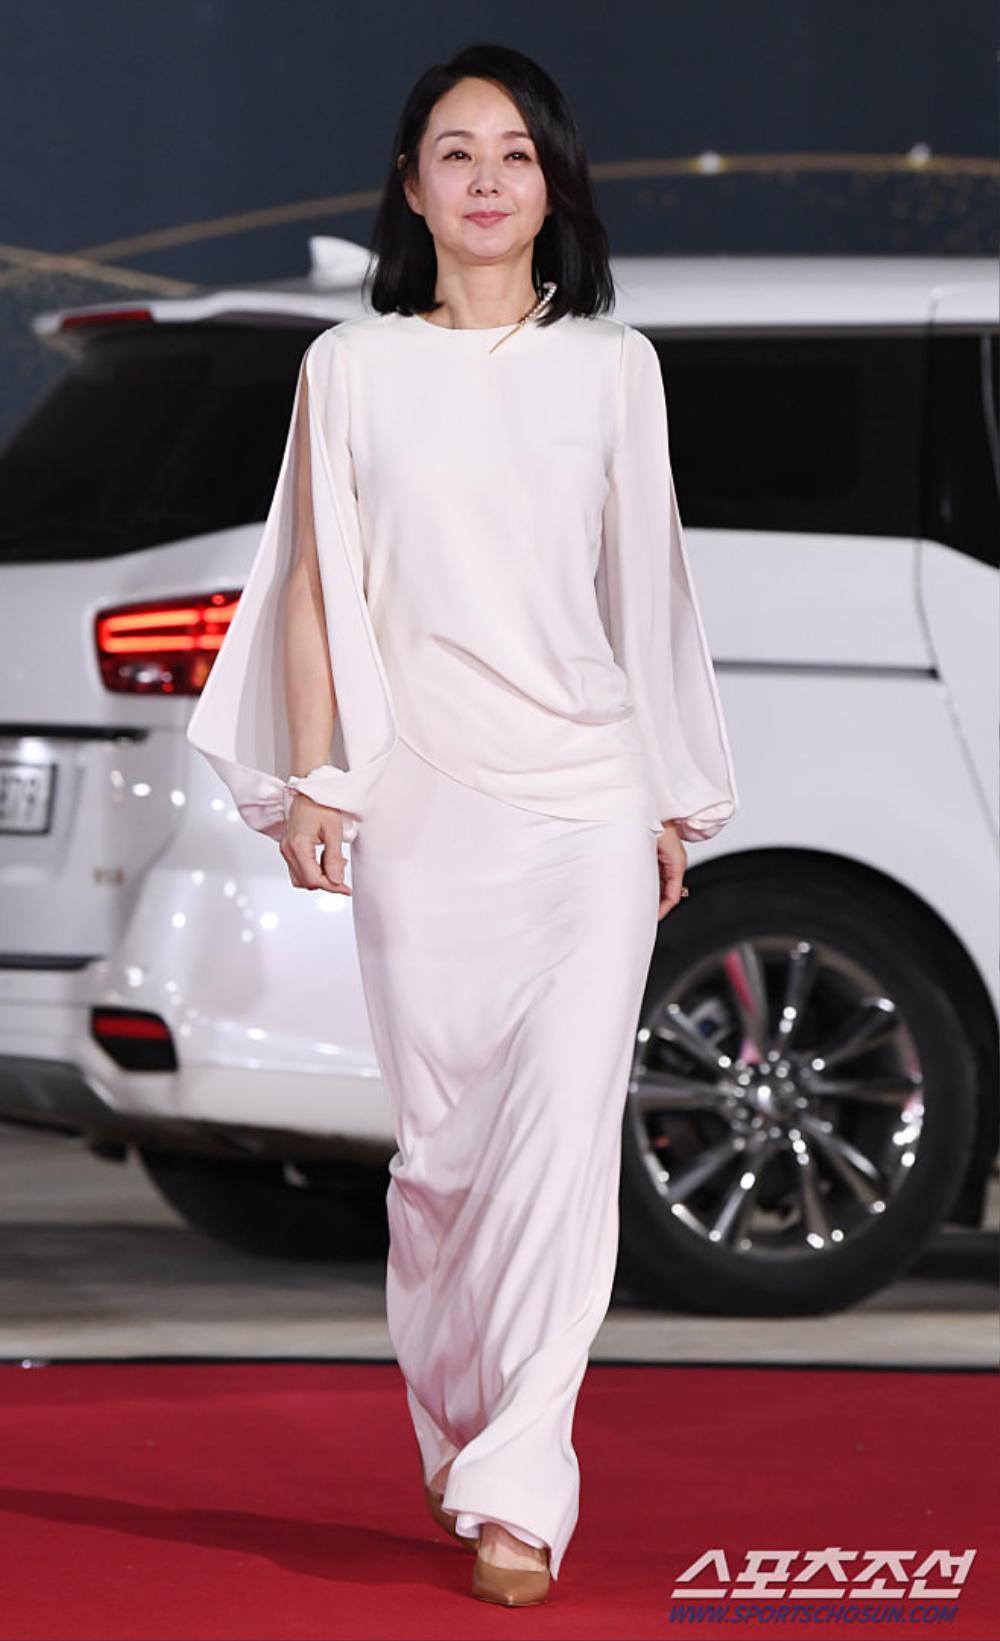 Thảm đỏ 'Rồng xanh 2020': Shin Hye Sun 'cân sắc' Shin Min Ah, Jung Woo Sung - Lee Byung Hun điển trai! Ảnh 13